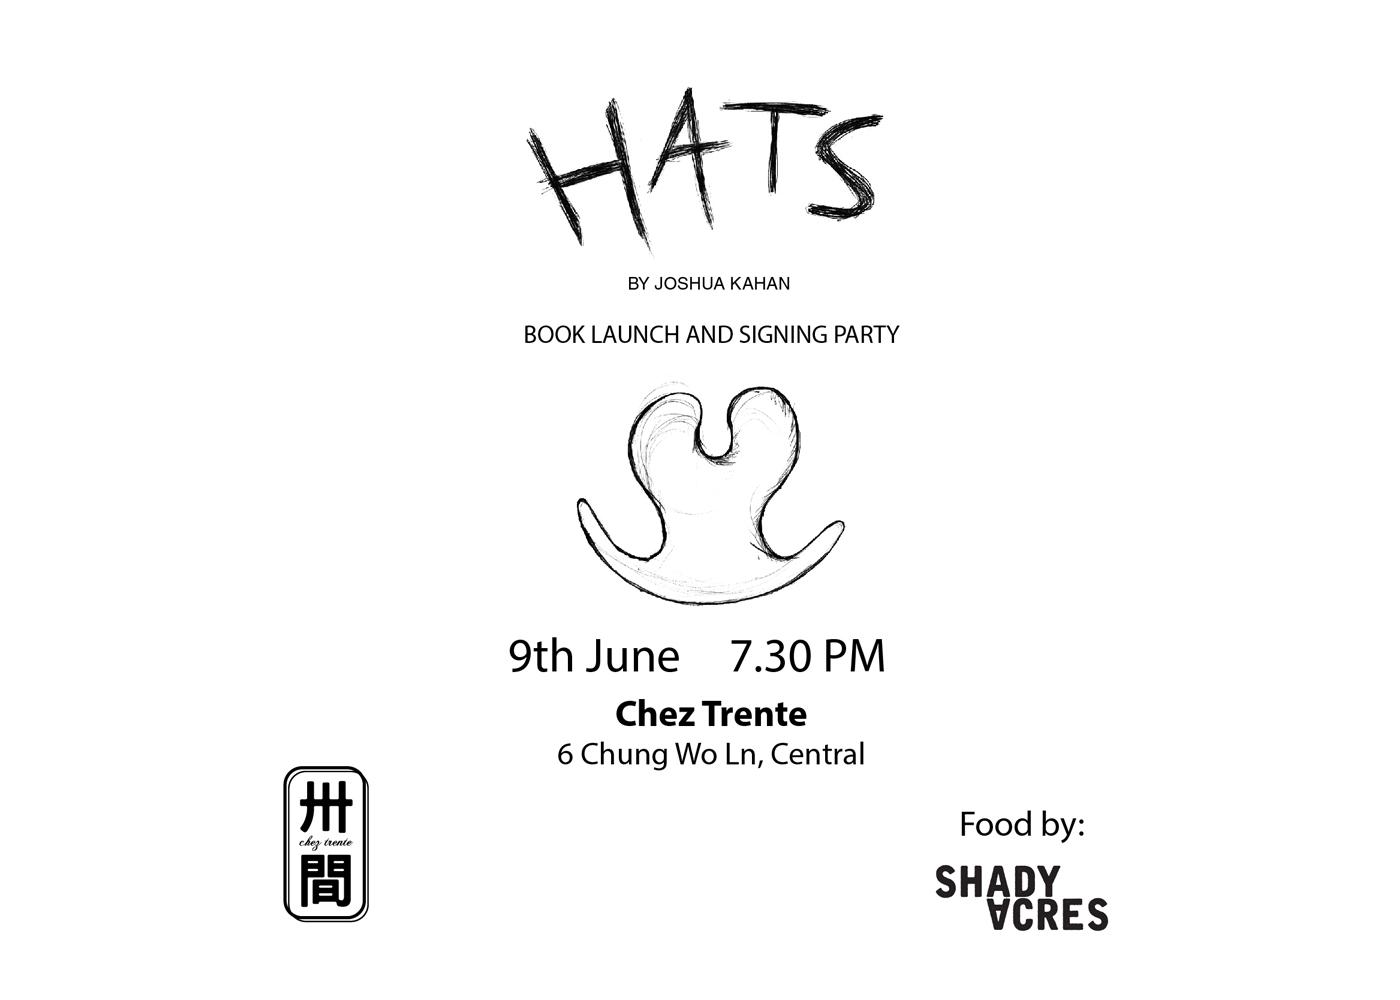 HATS By Joshua Kahan – Book Launch